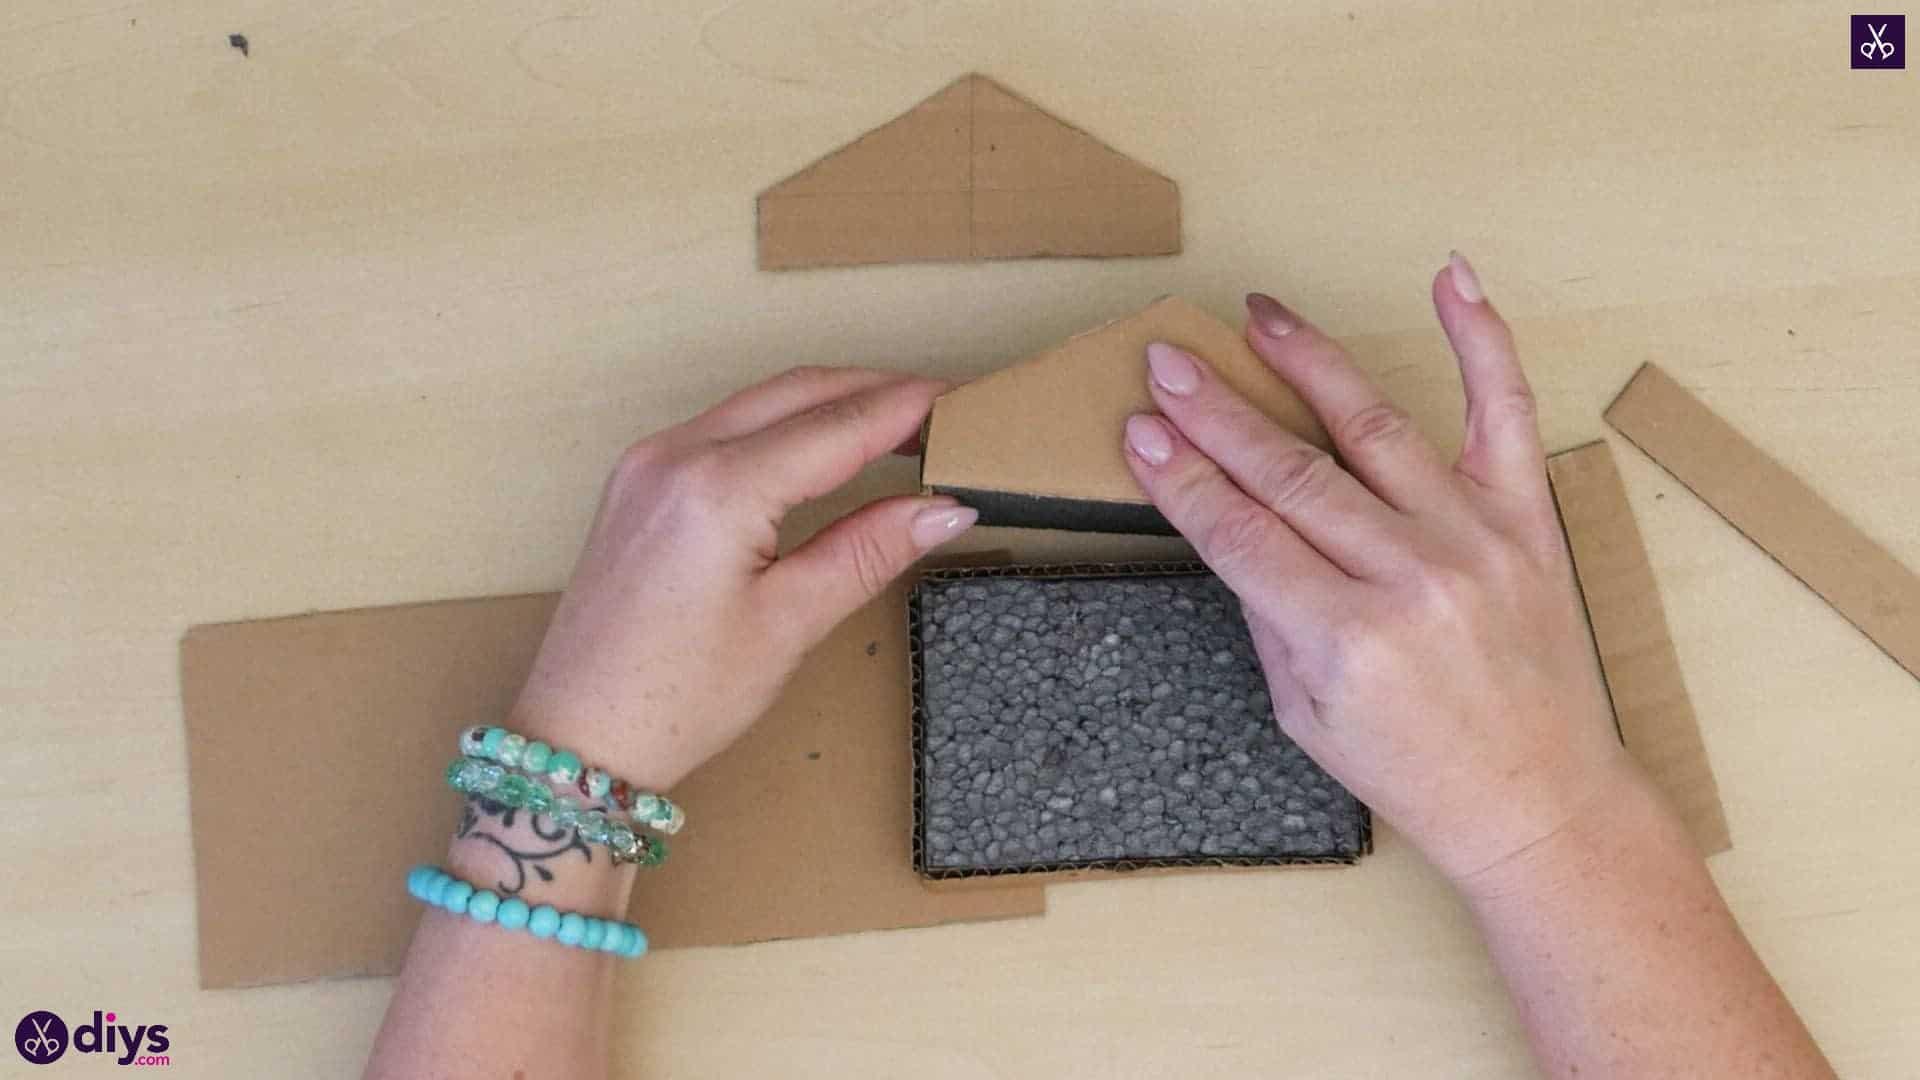 Diy miniature cage centerpiece step 5n